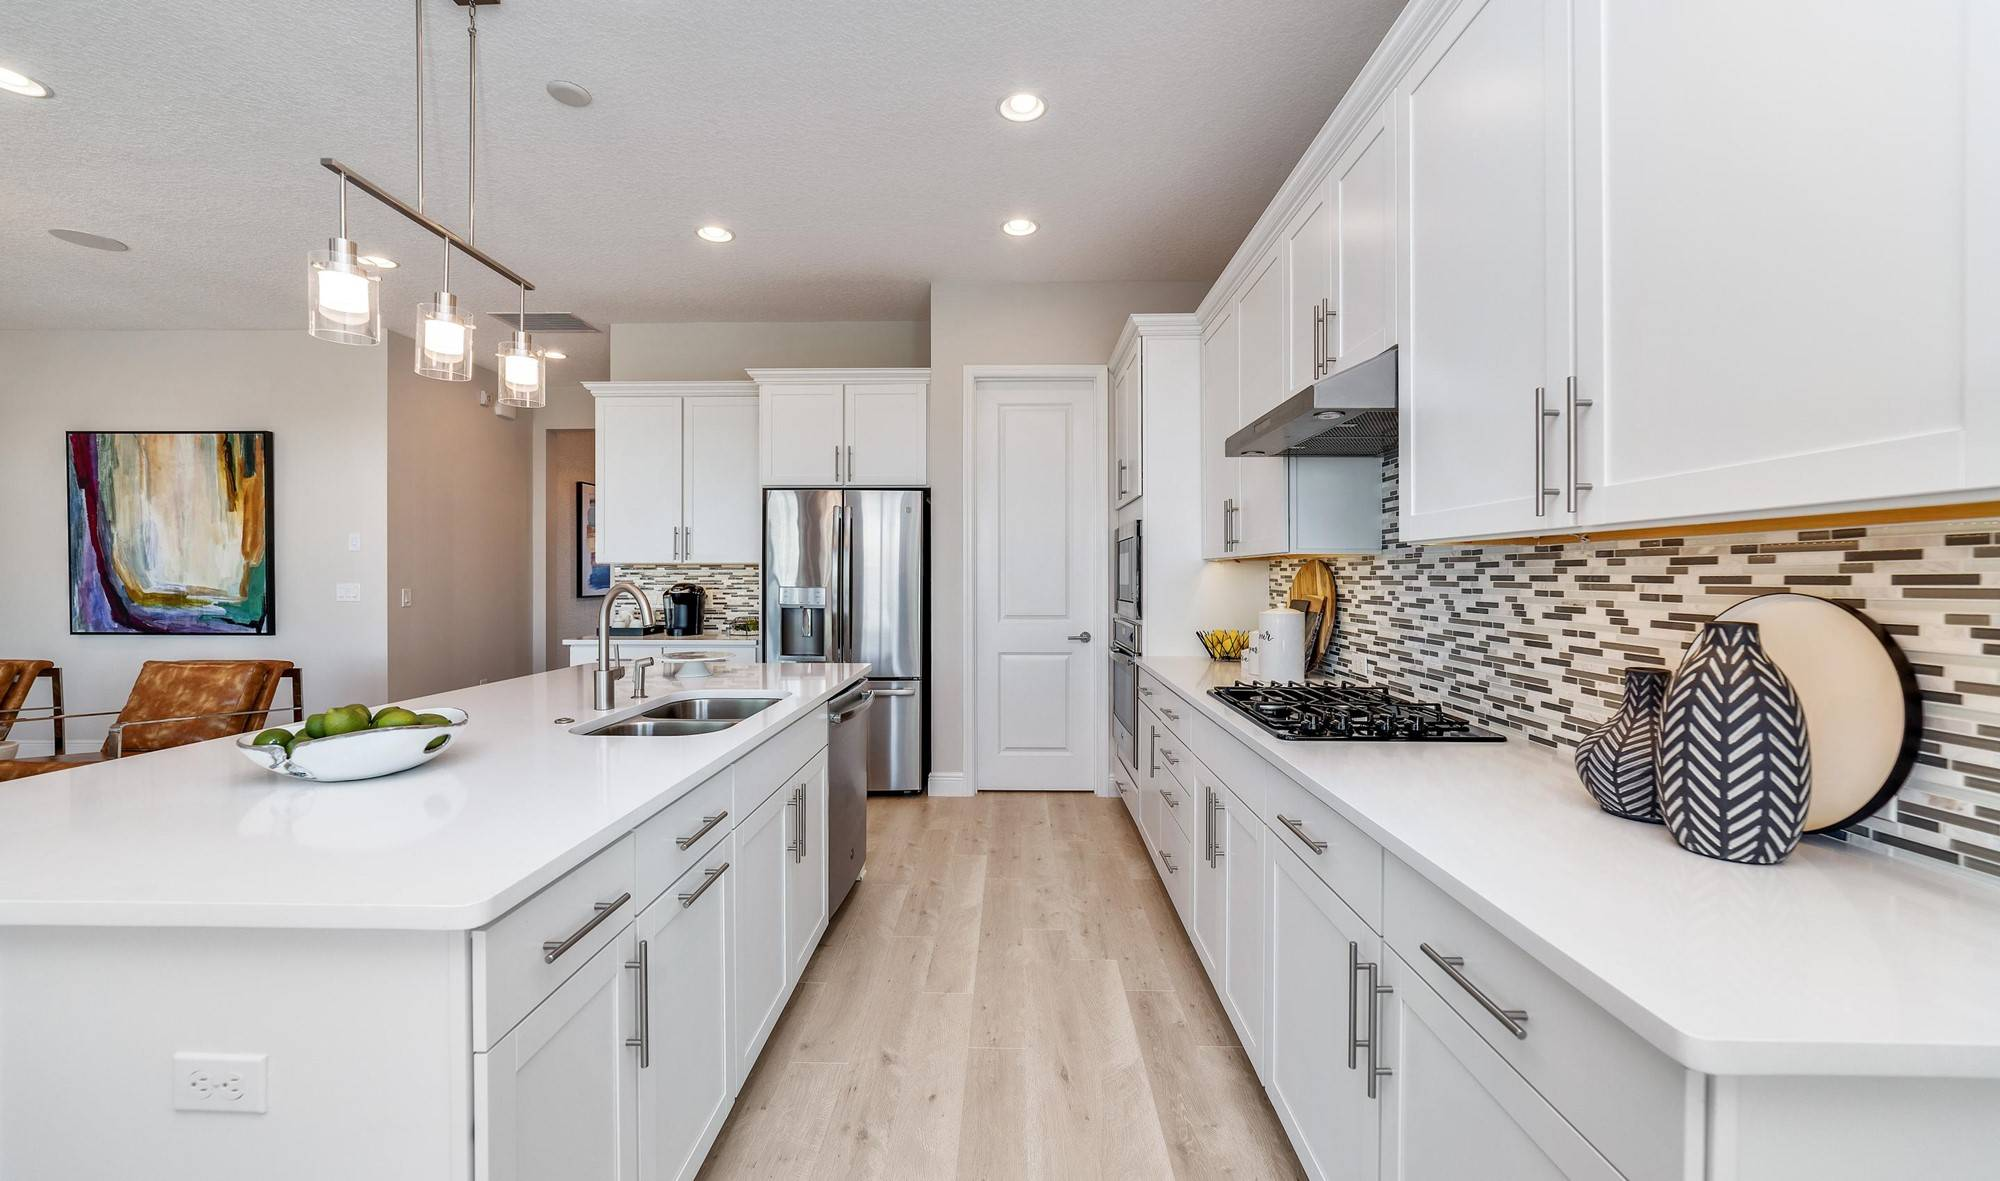 sanya-kitchen-island-new-homes-orlando-f